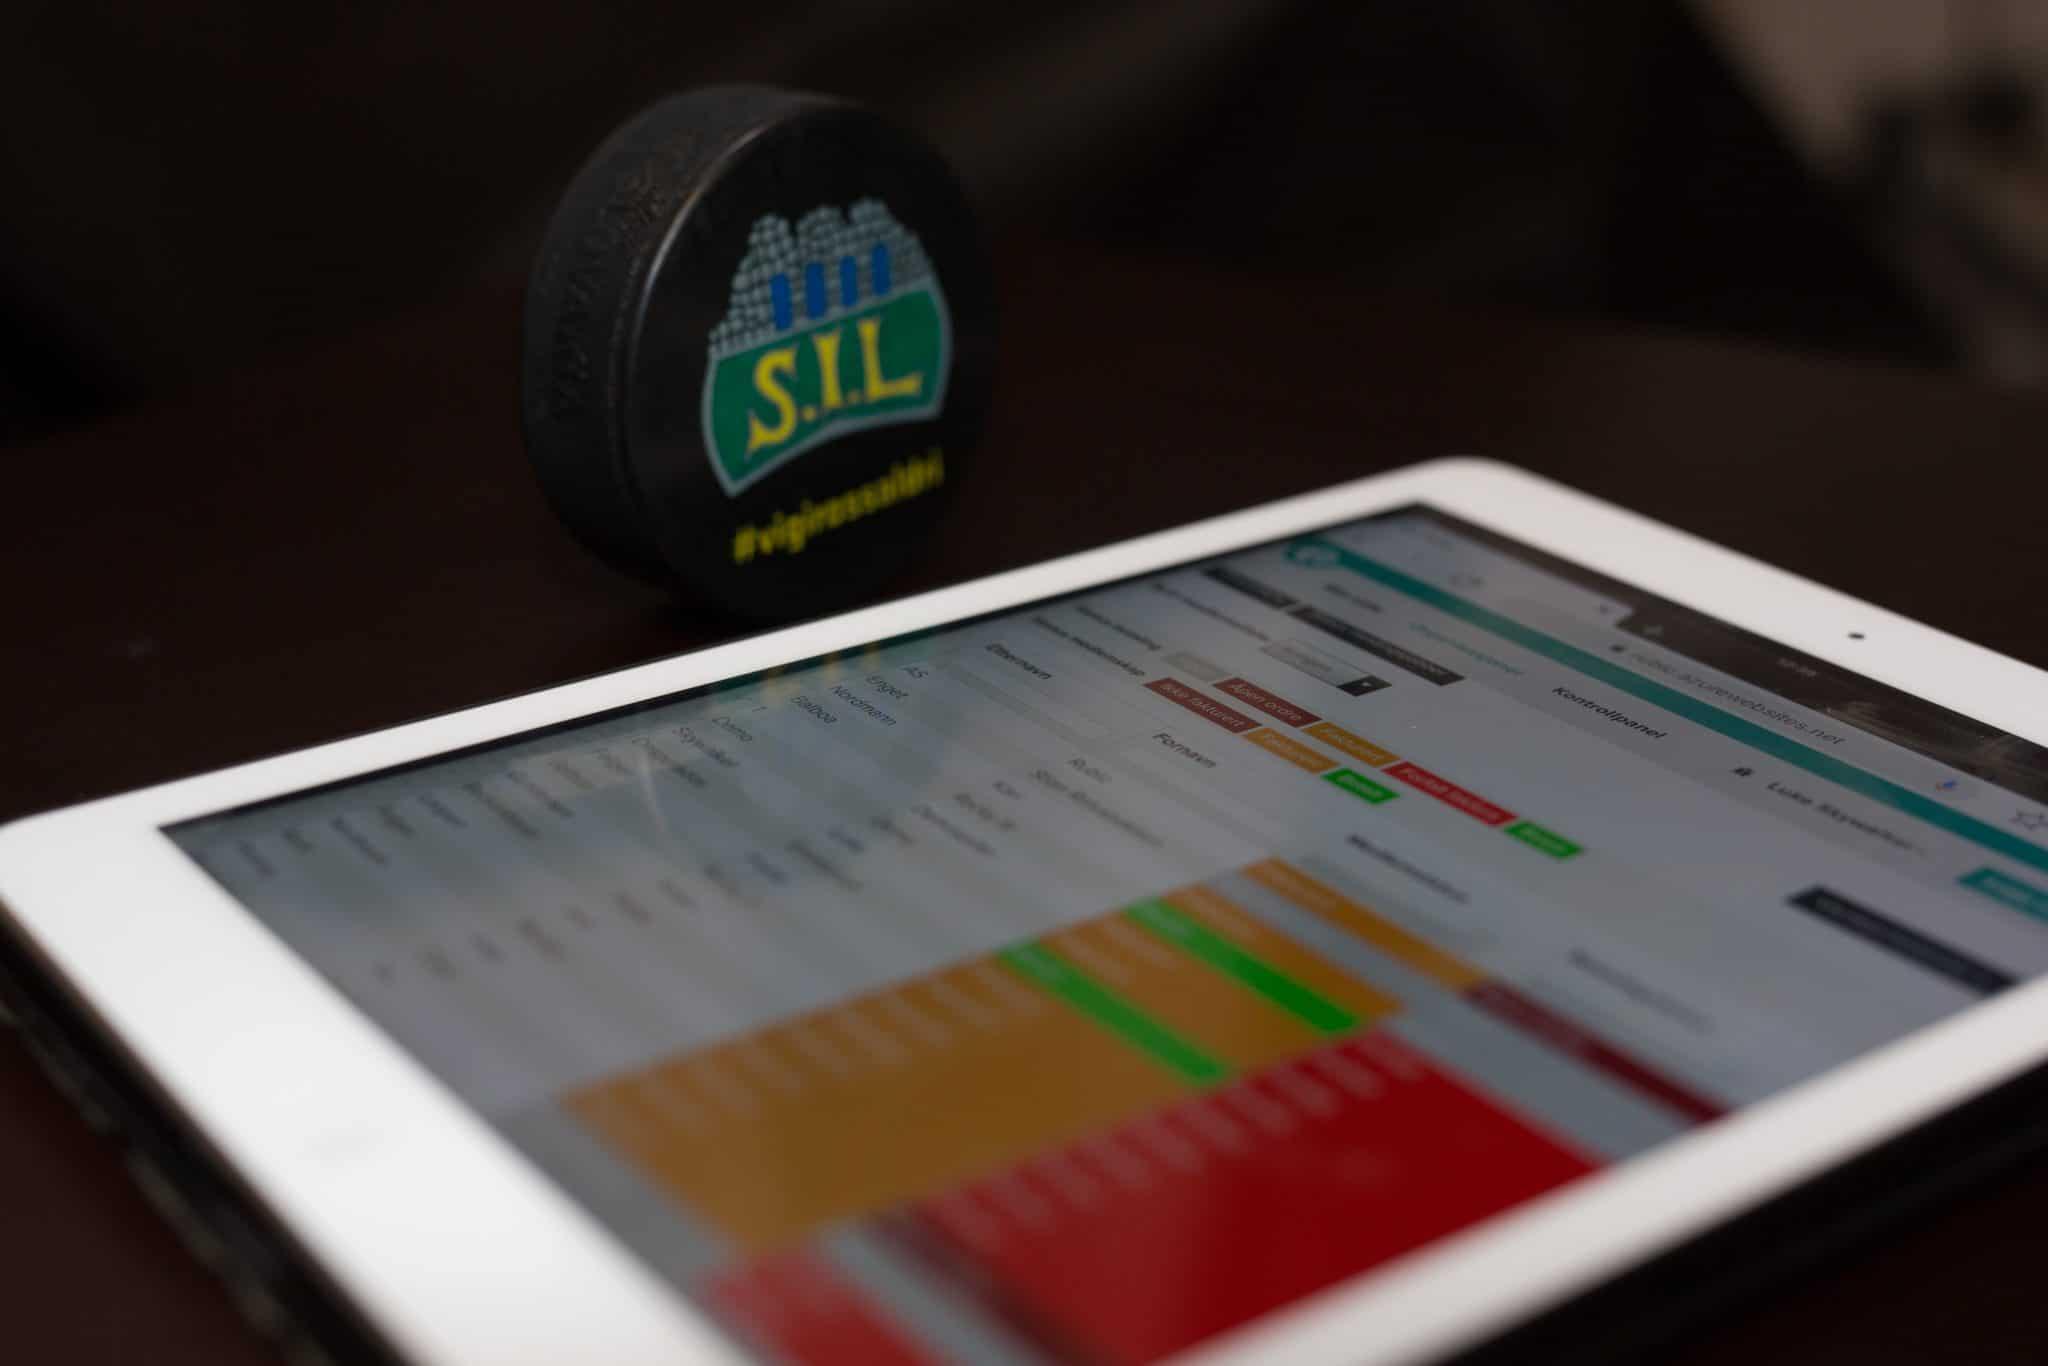 Medlesmssystemet til Rubic på iPad